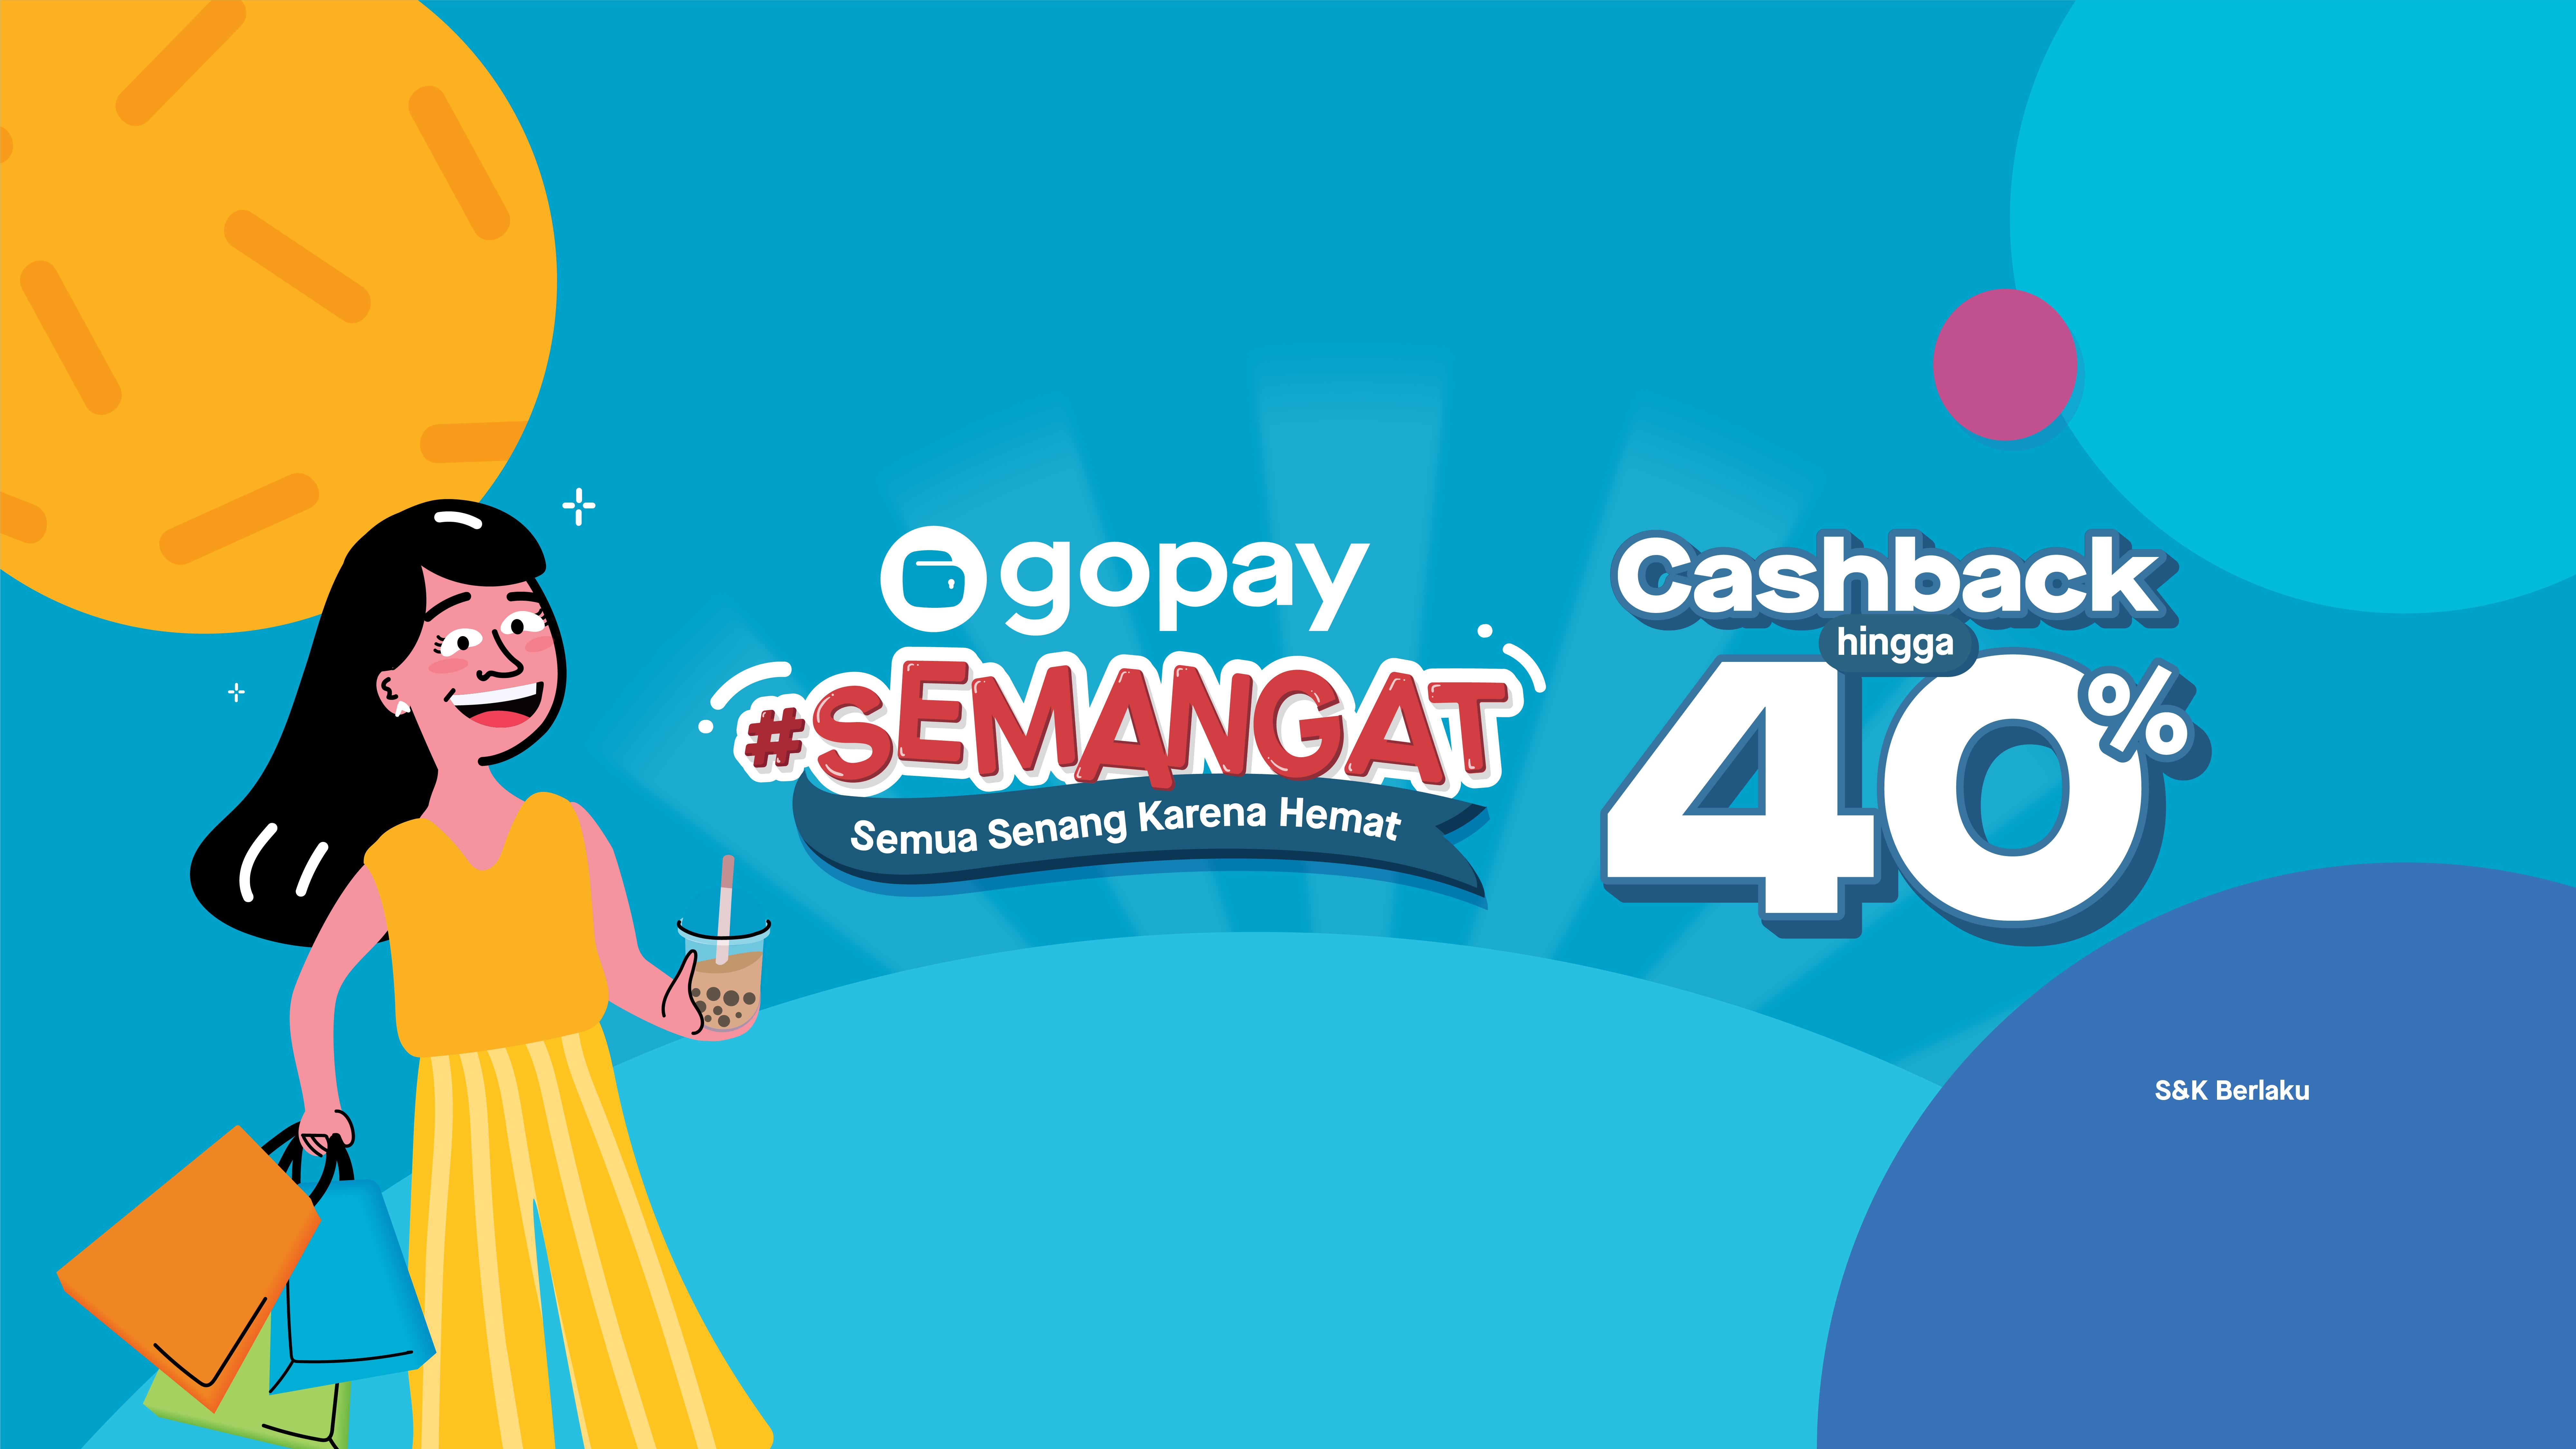 Promo Semangat Hari Ini November 2019 Cashback Hingga 40 Gopay